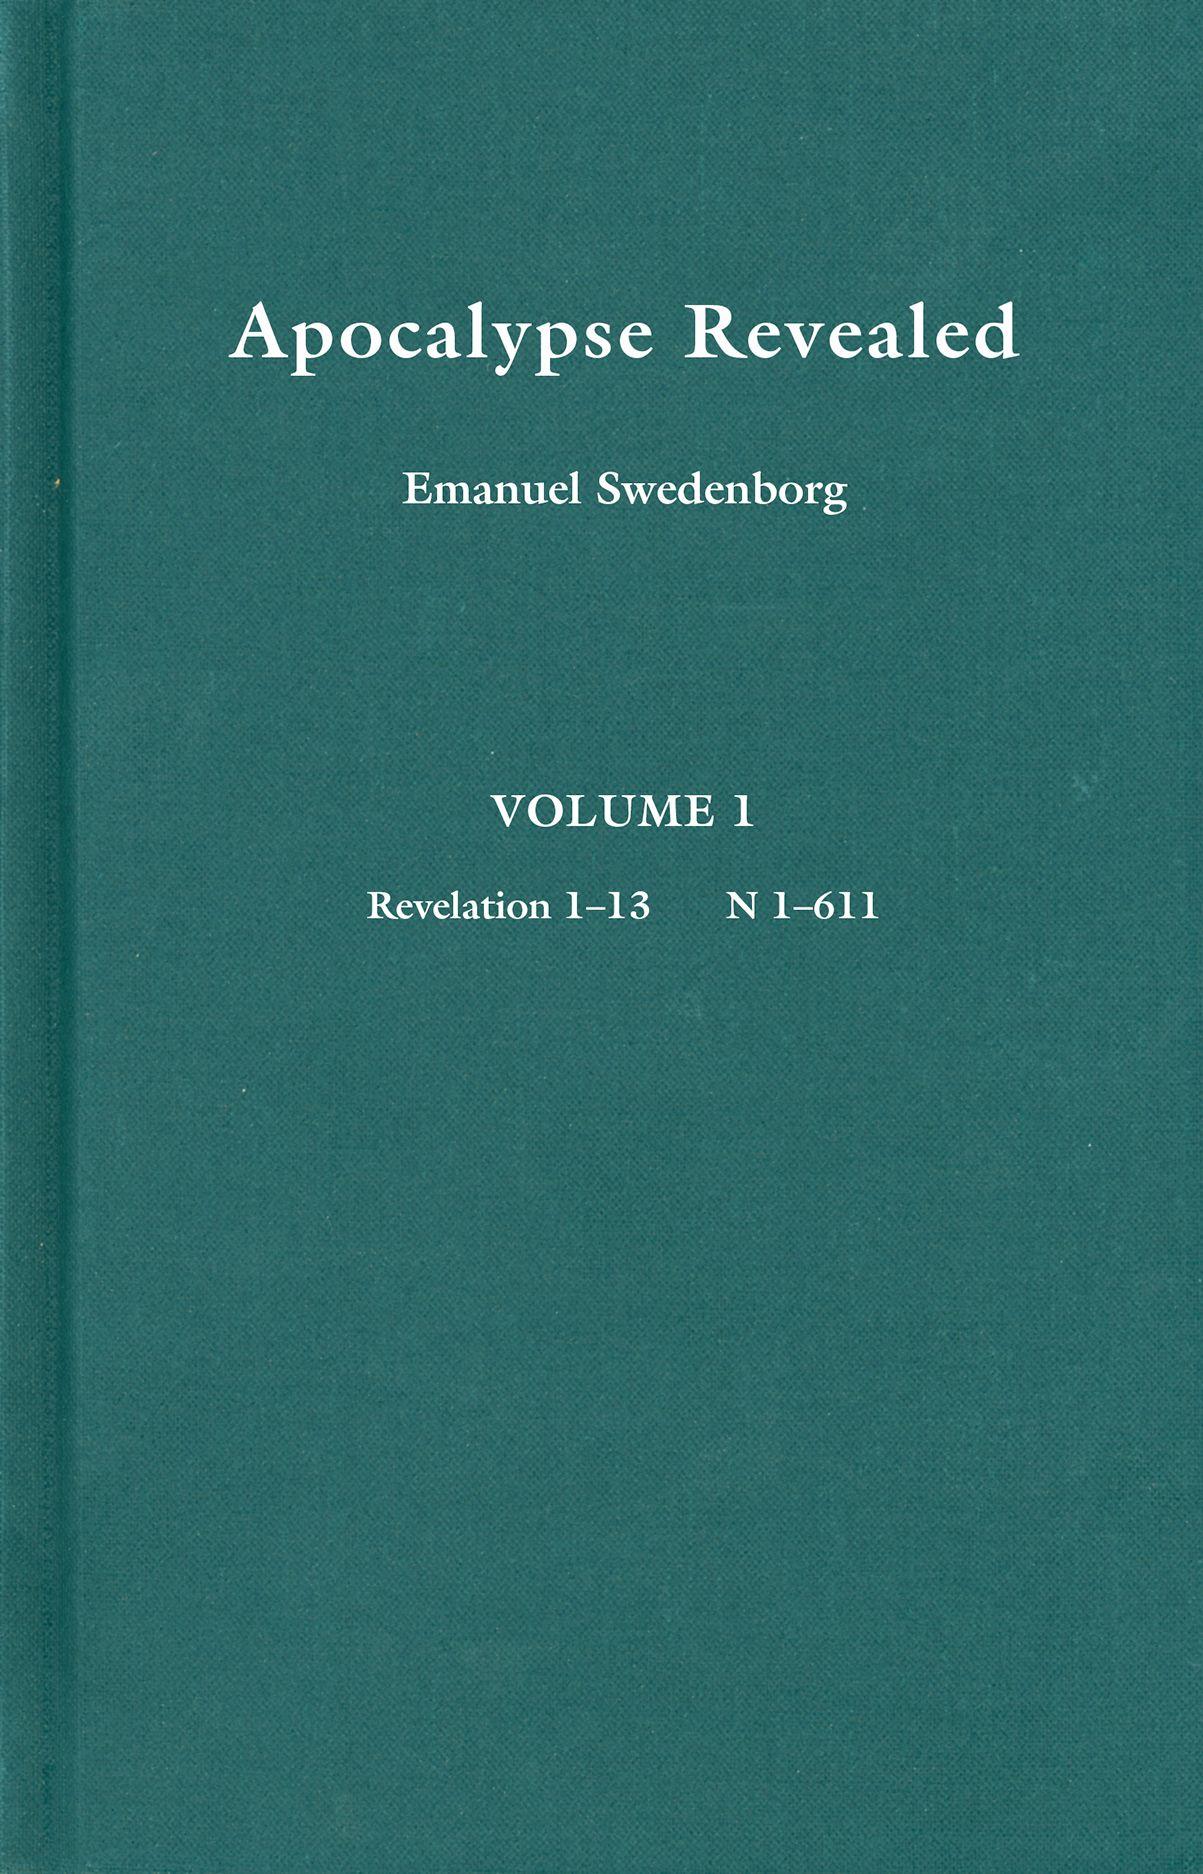 APOCALYPSE REVEALED 1